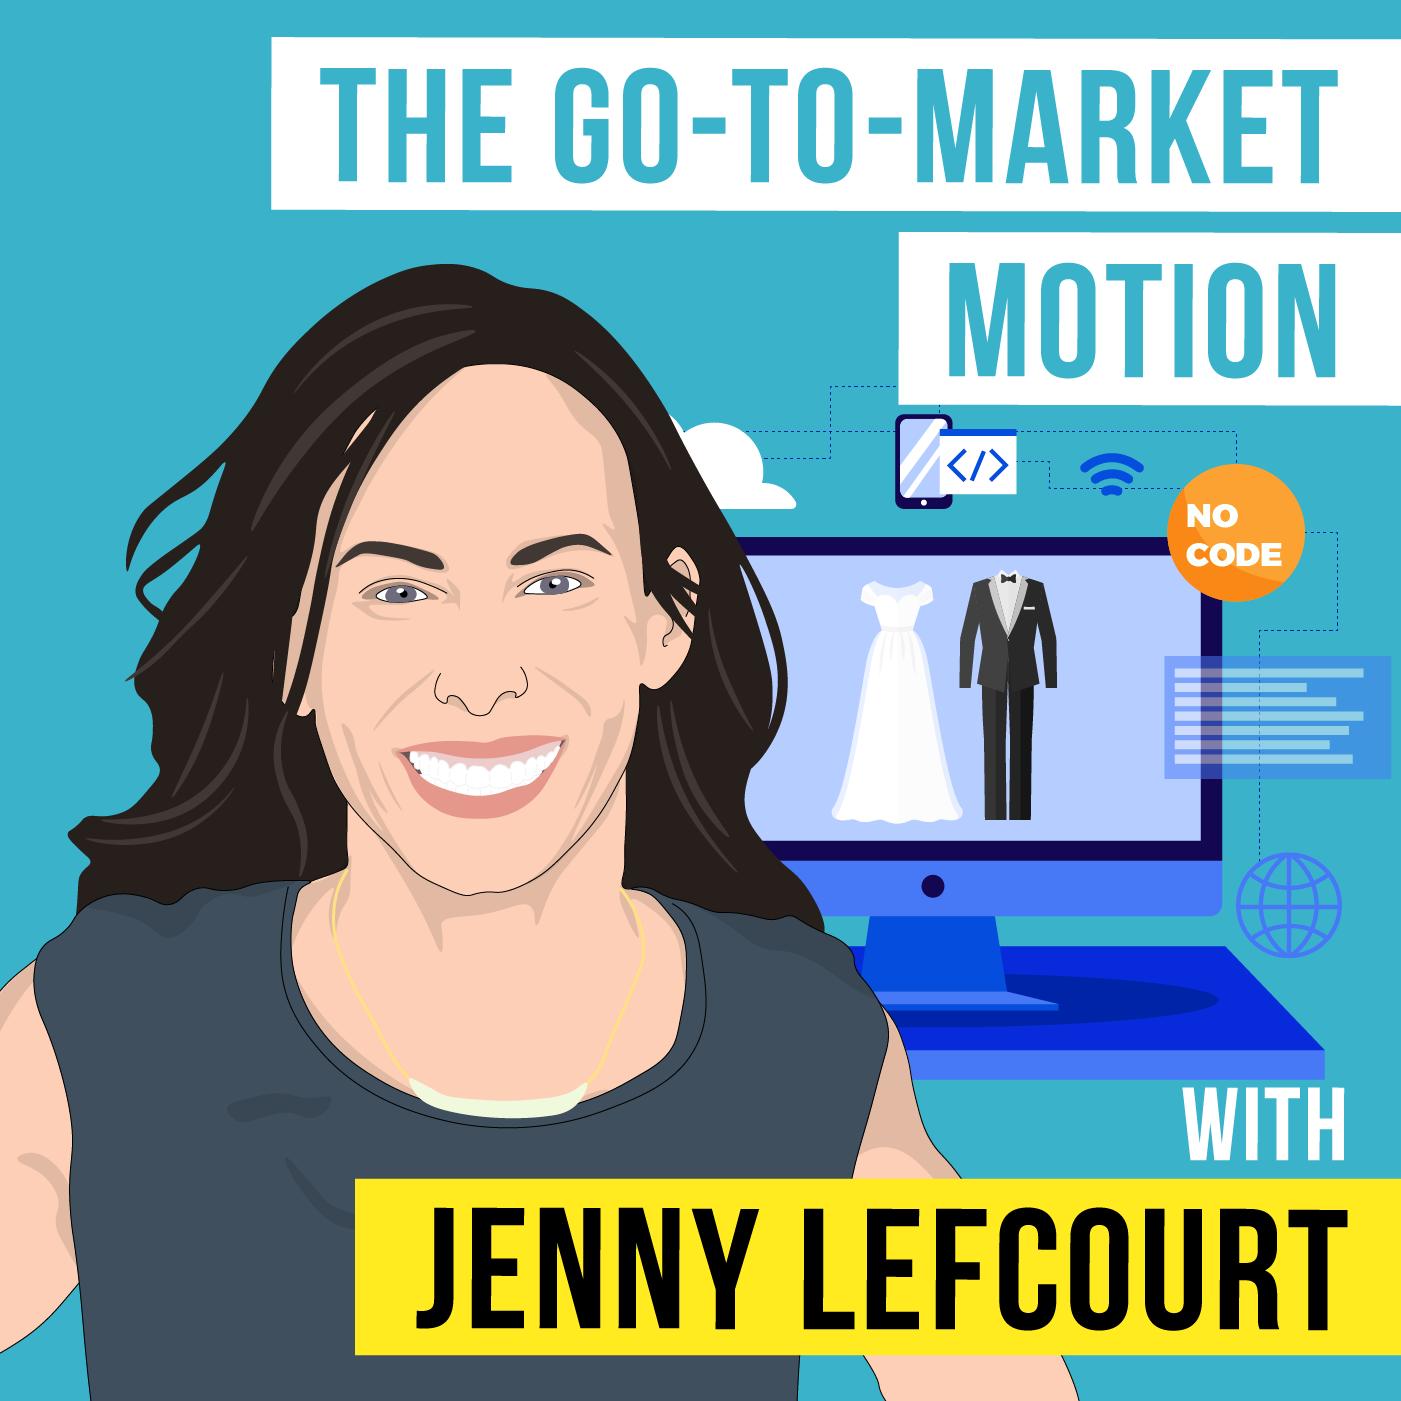 Jenny Lefcourt - The Go-to-Market Motion - [Invest Like the Best, EP. 245]